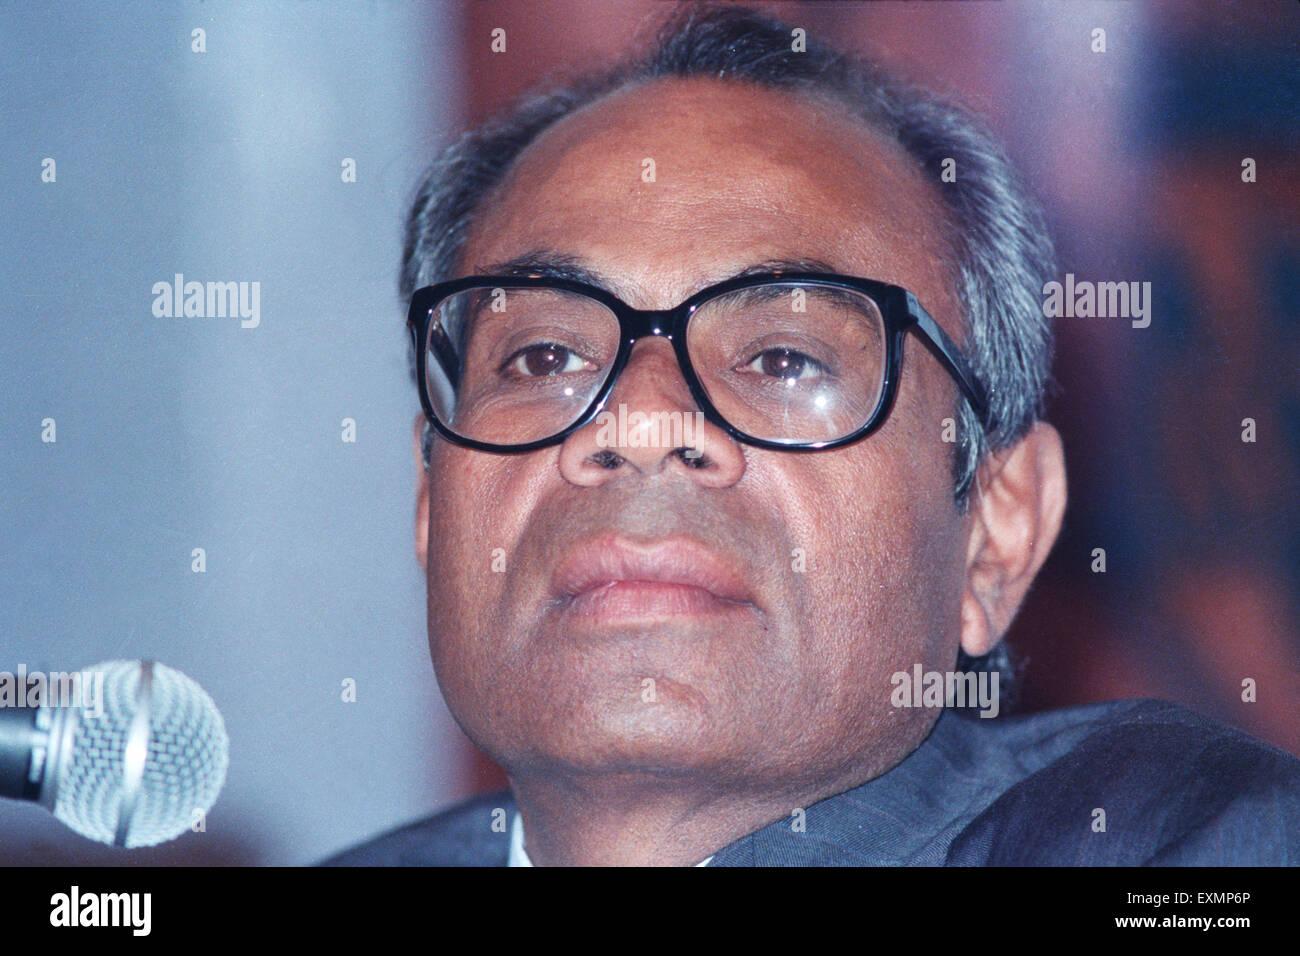 Indian businessman Gopichand Hinduja owner of Hinduja group India